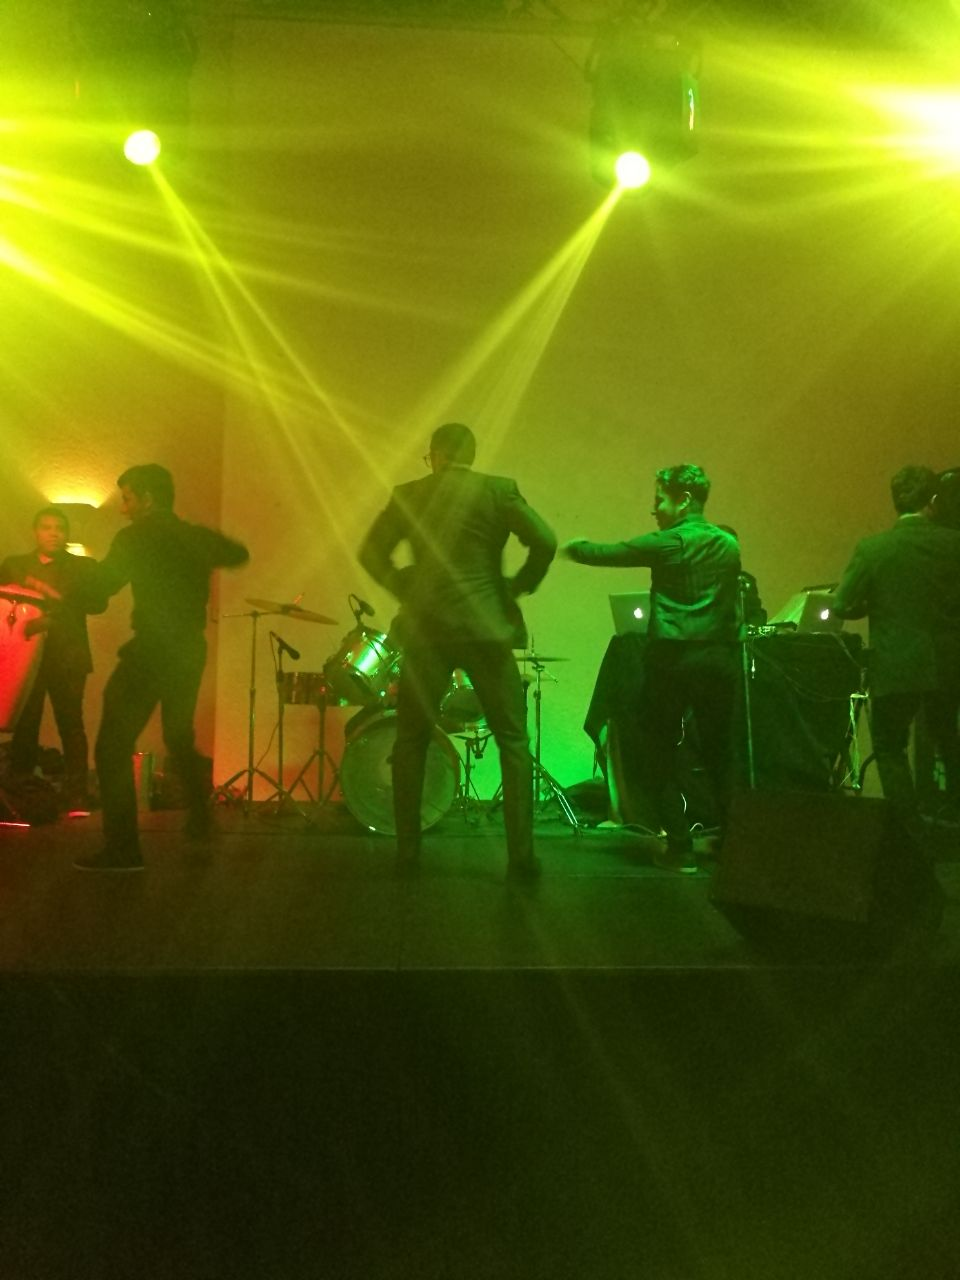 guatemalan wedding gringo dancing